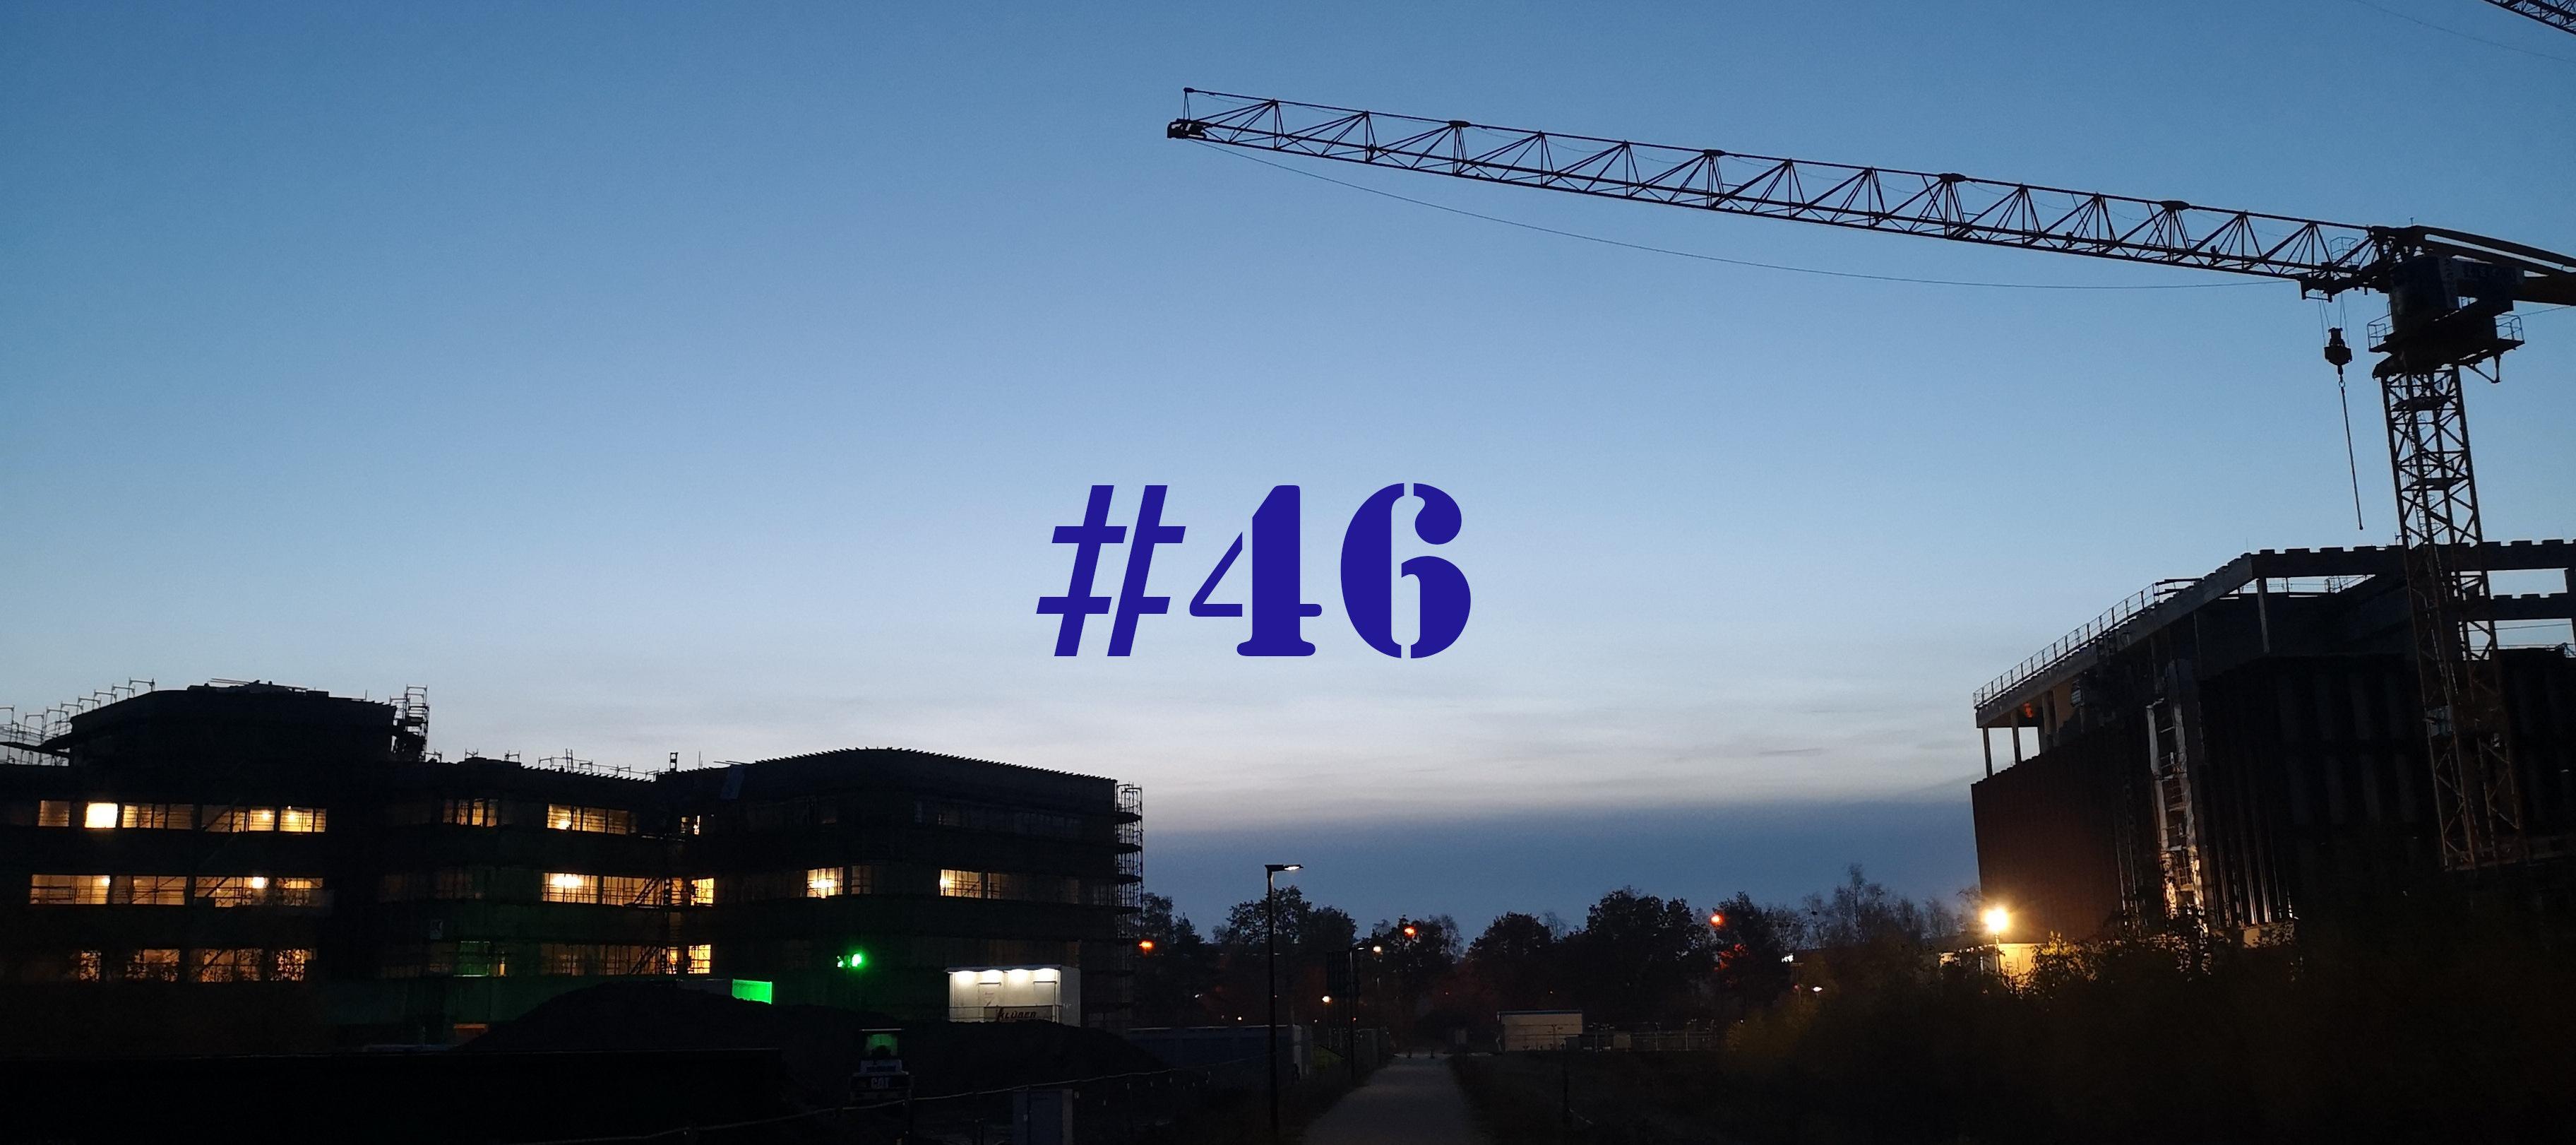 Community Wochenrückblick #46